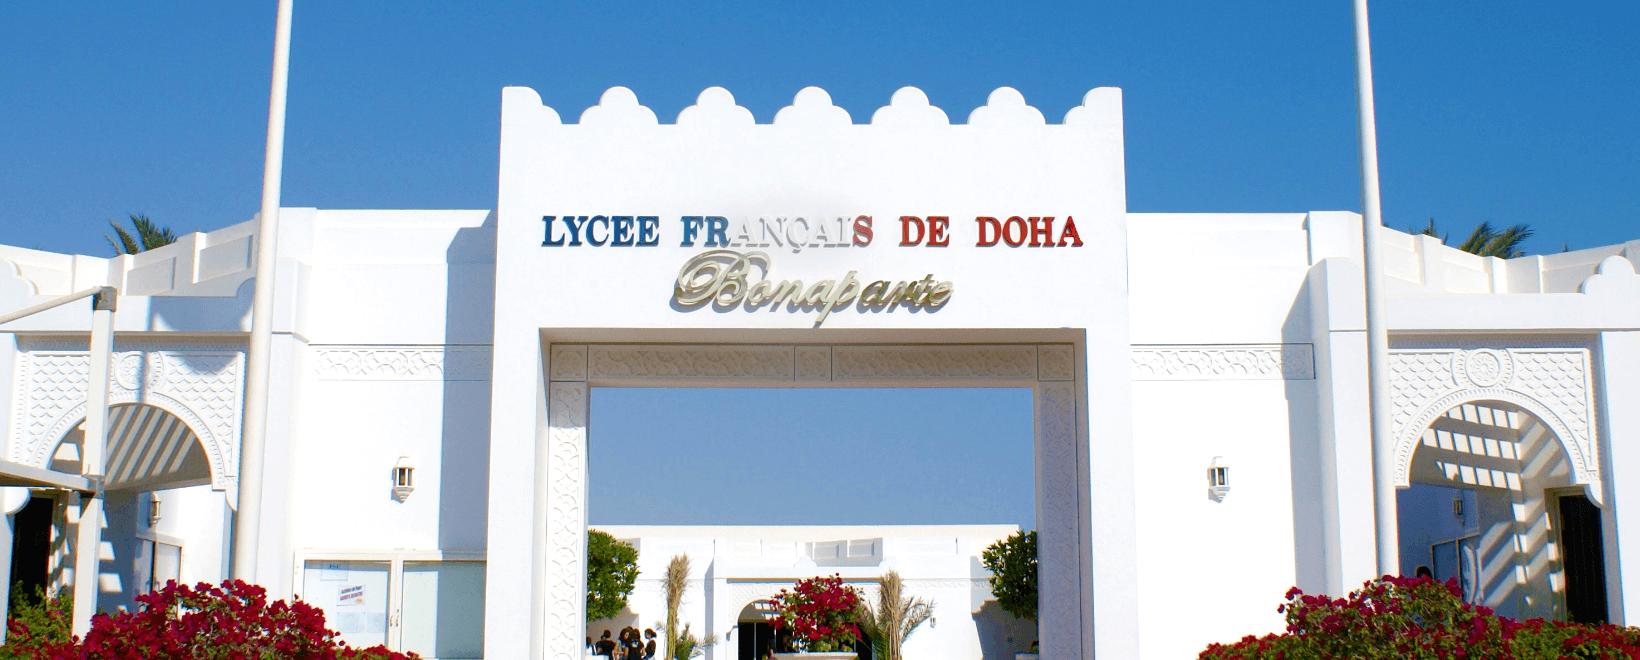 Bonaparte School Doha Photo